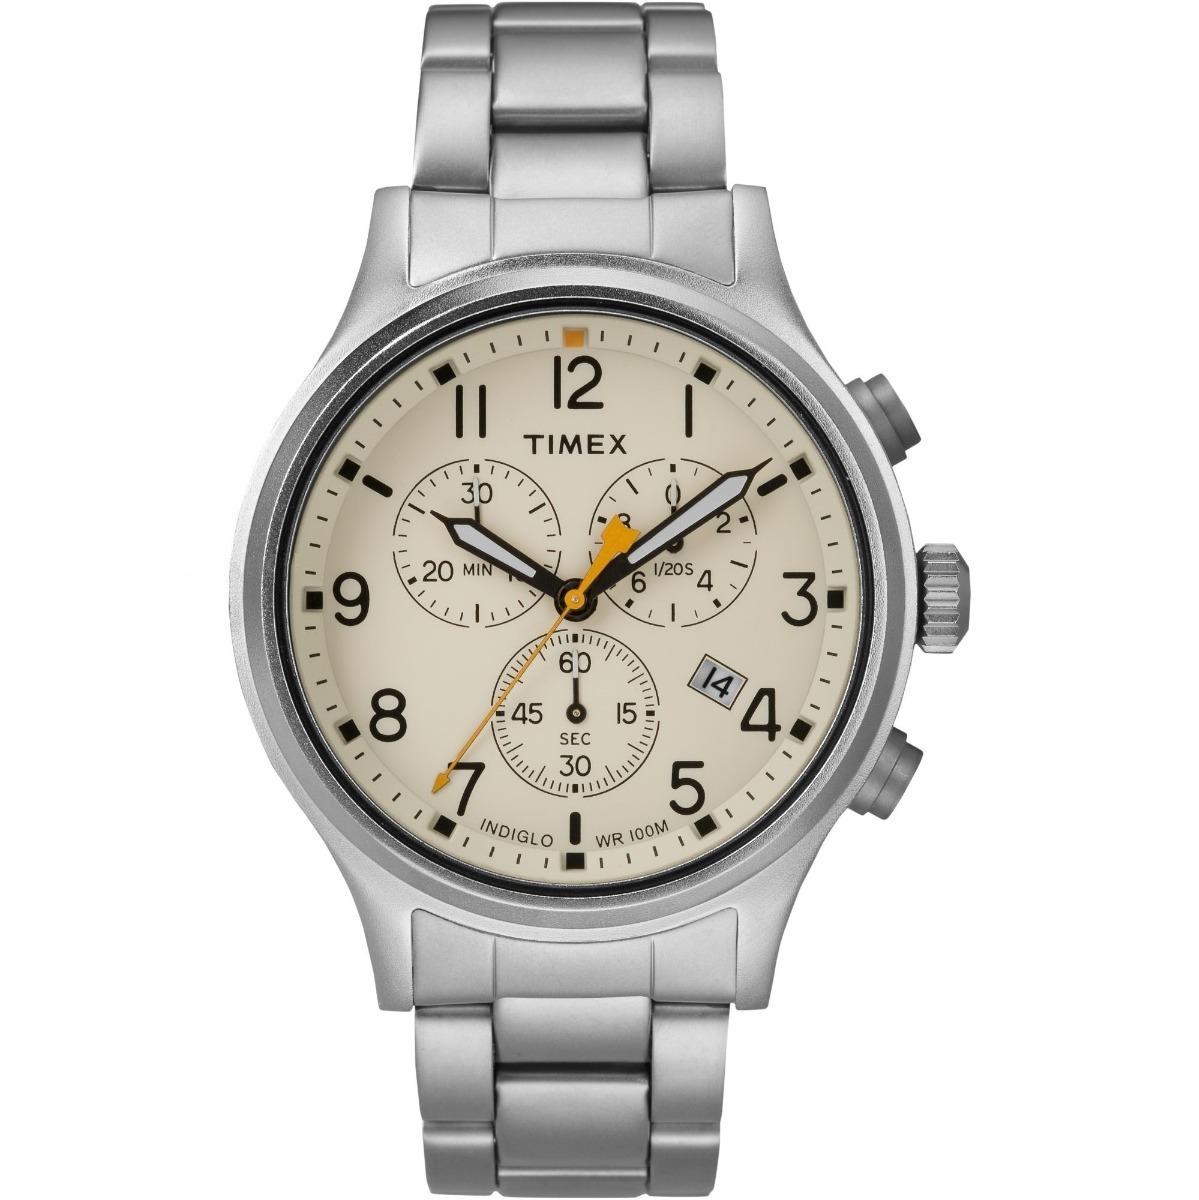 2078e1ee3ea6 reloj timex tw2r47600 100% original para caballero. Cargando zoom.